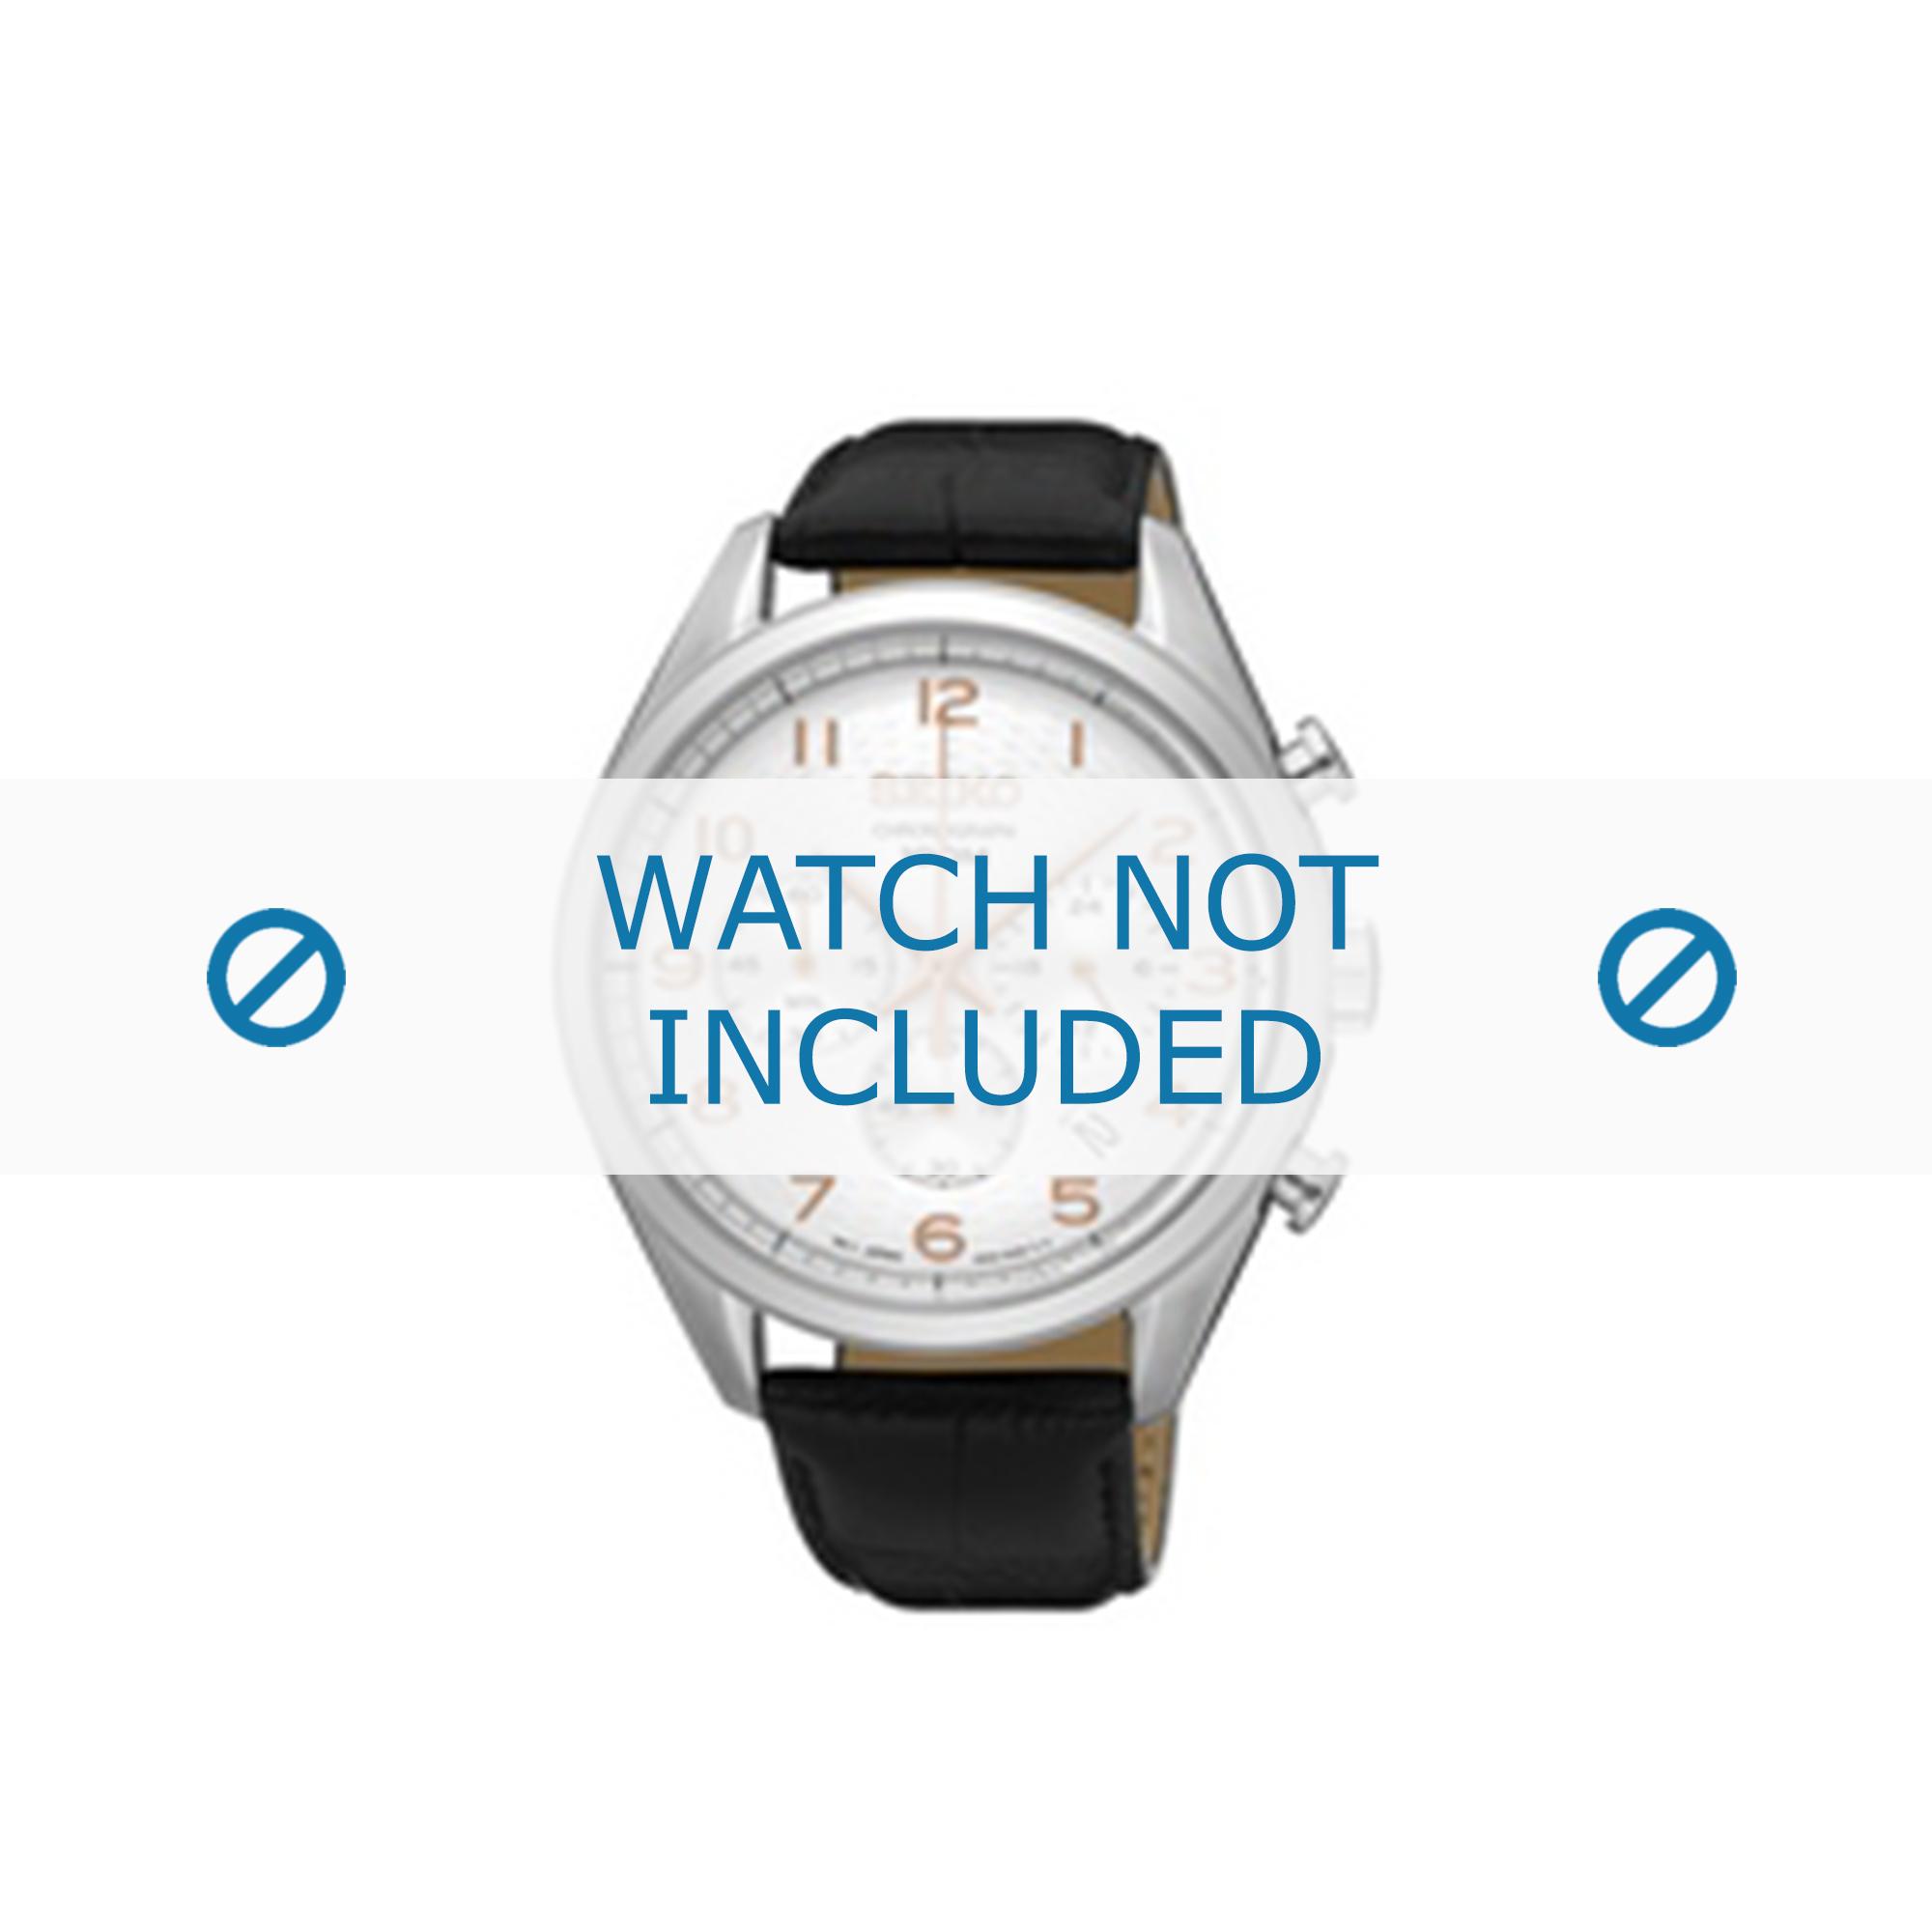 Seiko horlogeband SSB227P1 / 8T63 00C0 Leder Zwart 20mm + zwart stiksel